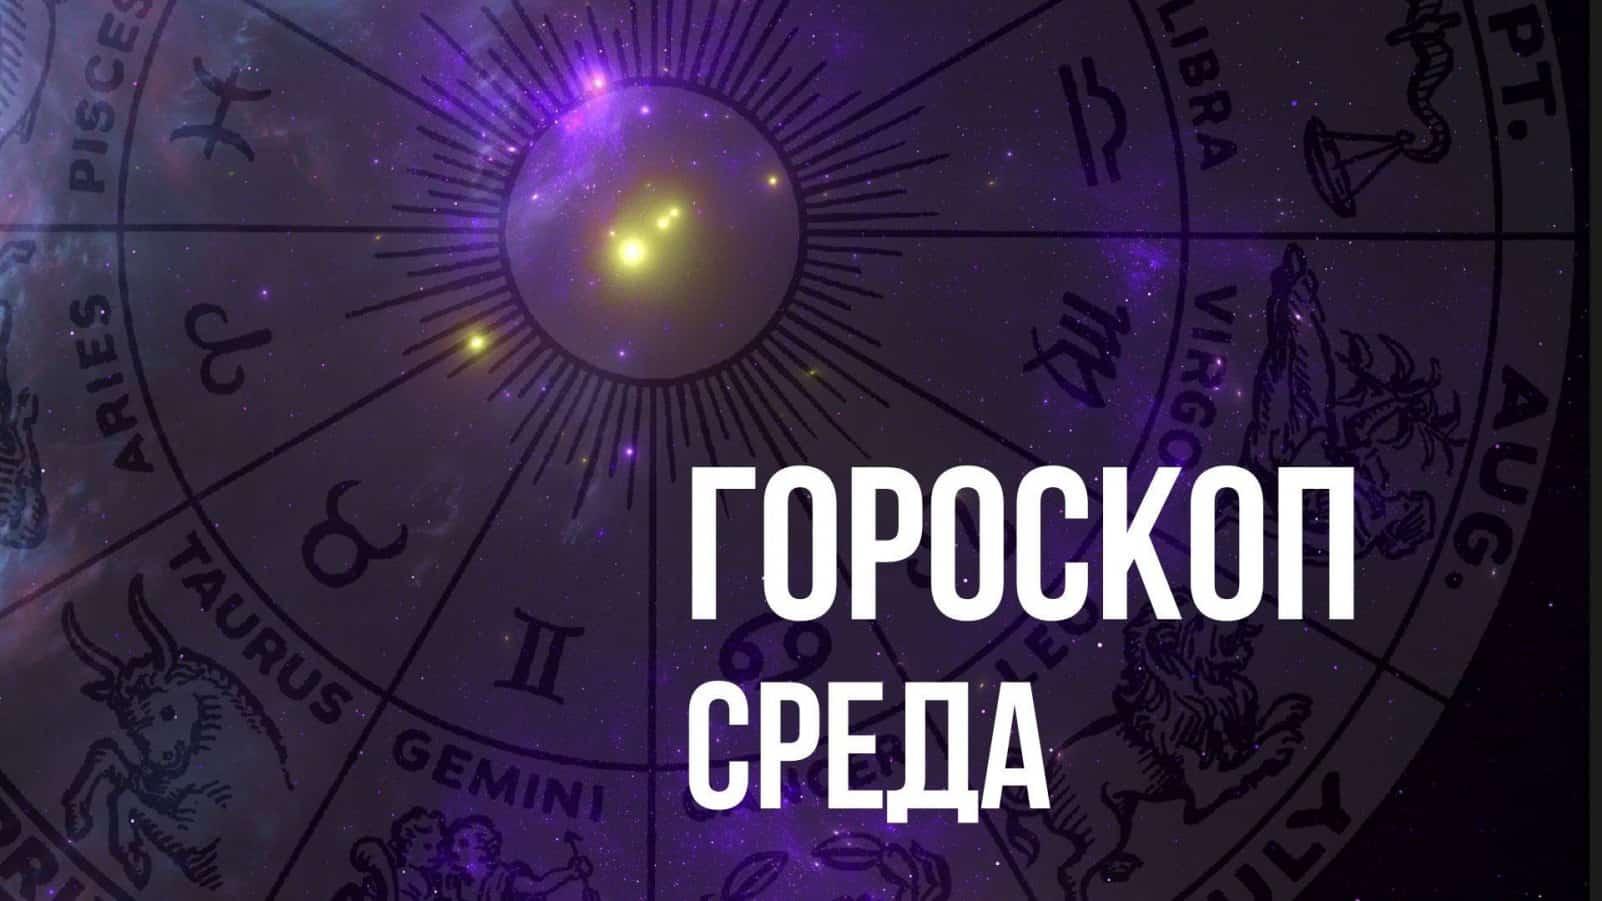 Гороскоп на среду 22 сентября для каждого знака Зодиака